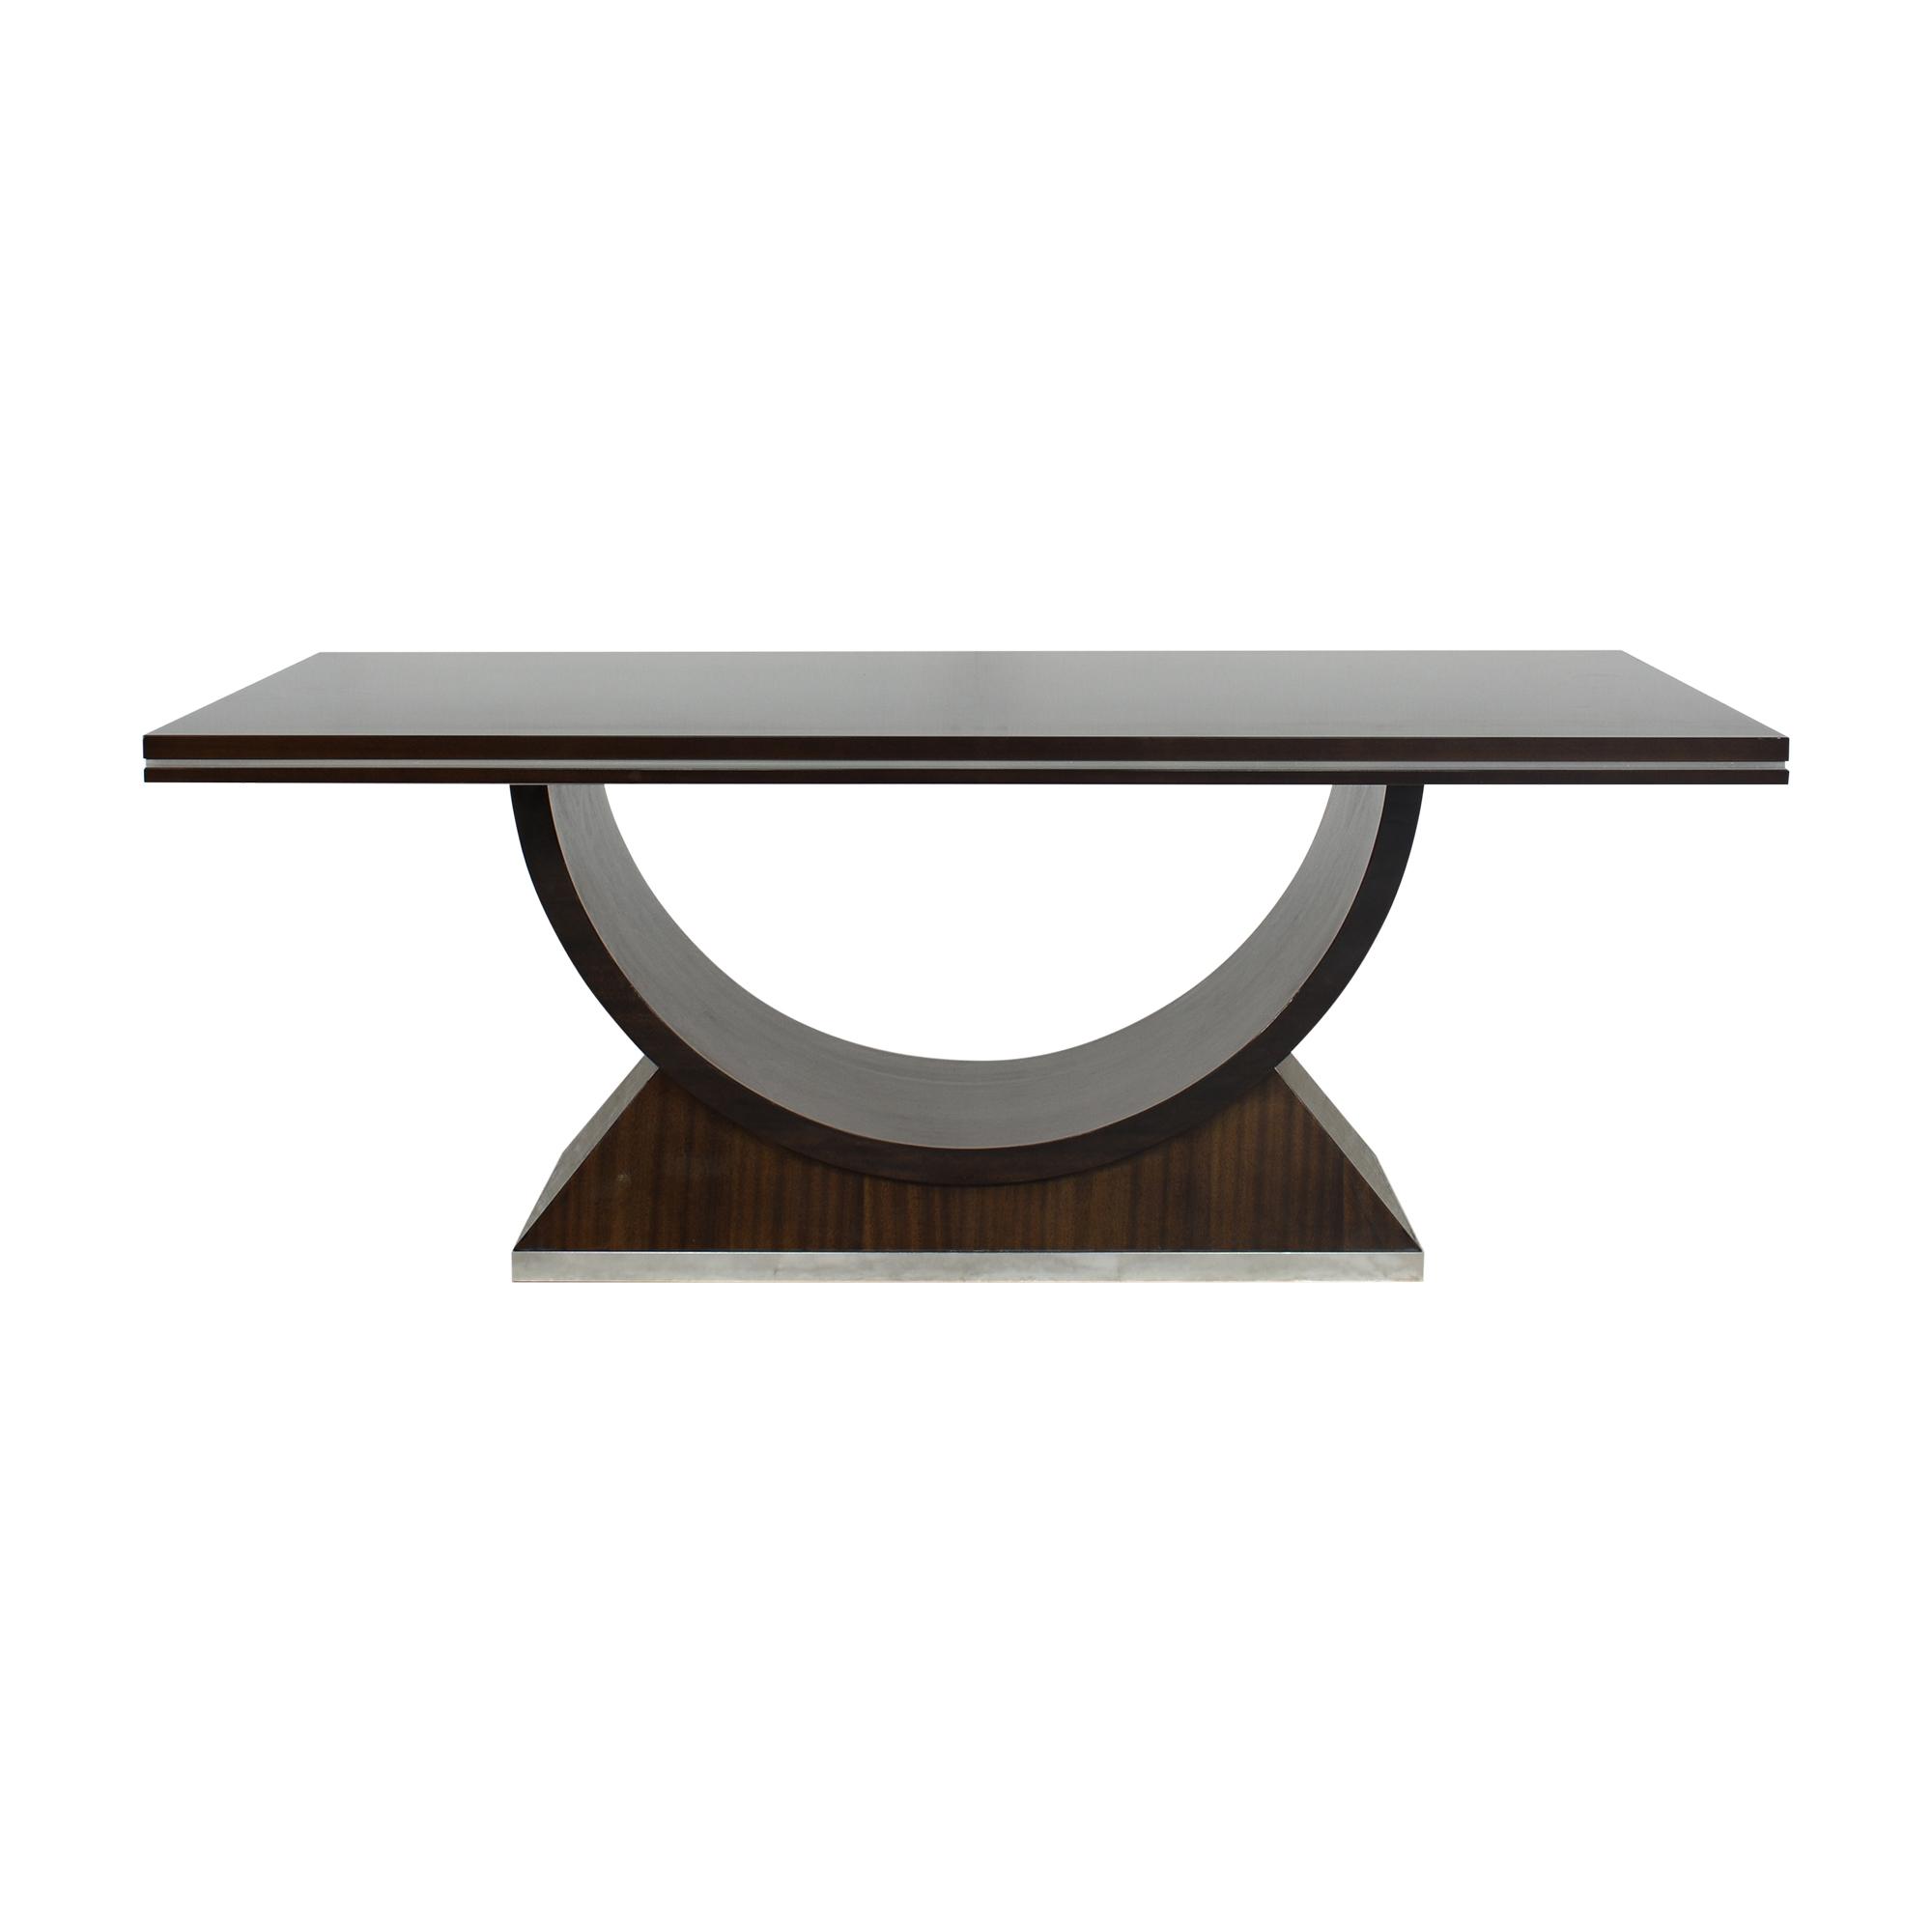 Pietro Costantini Pietro Costantini Contemporary Extendable Dining Table ma